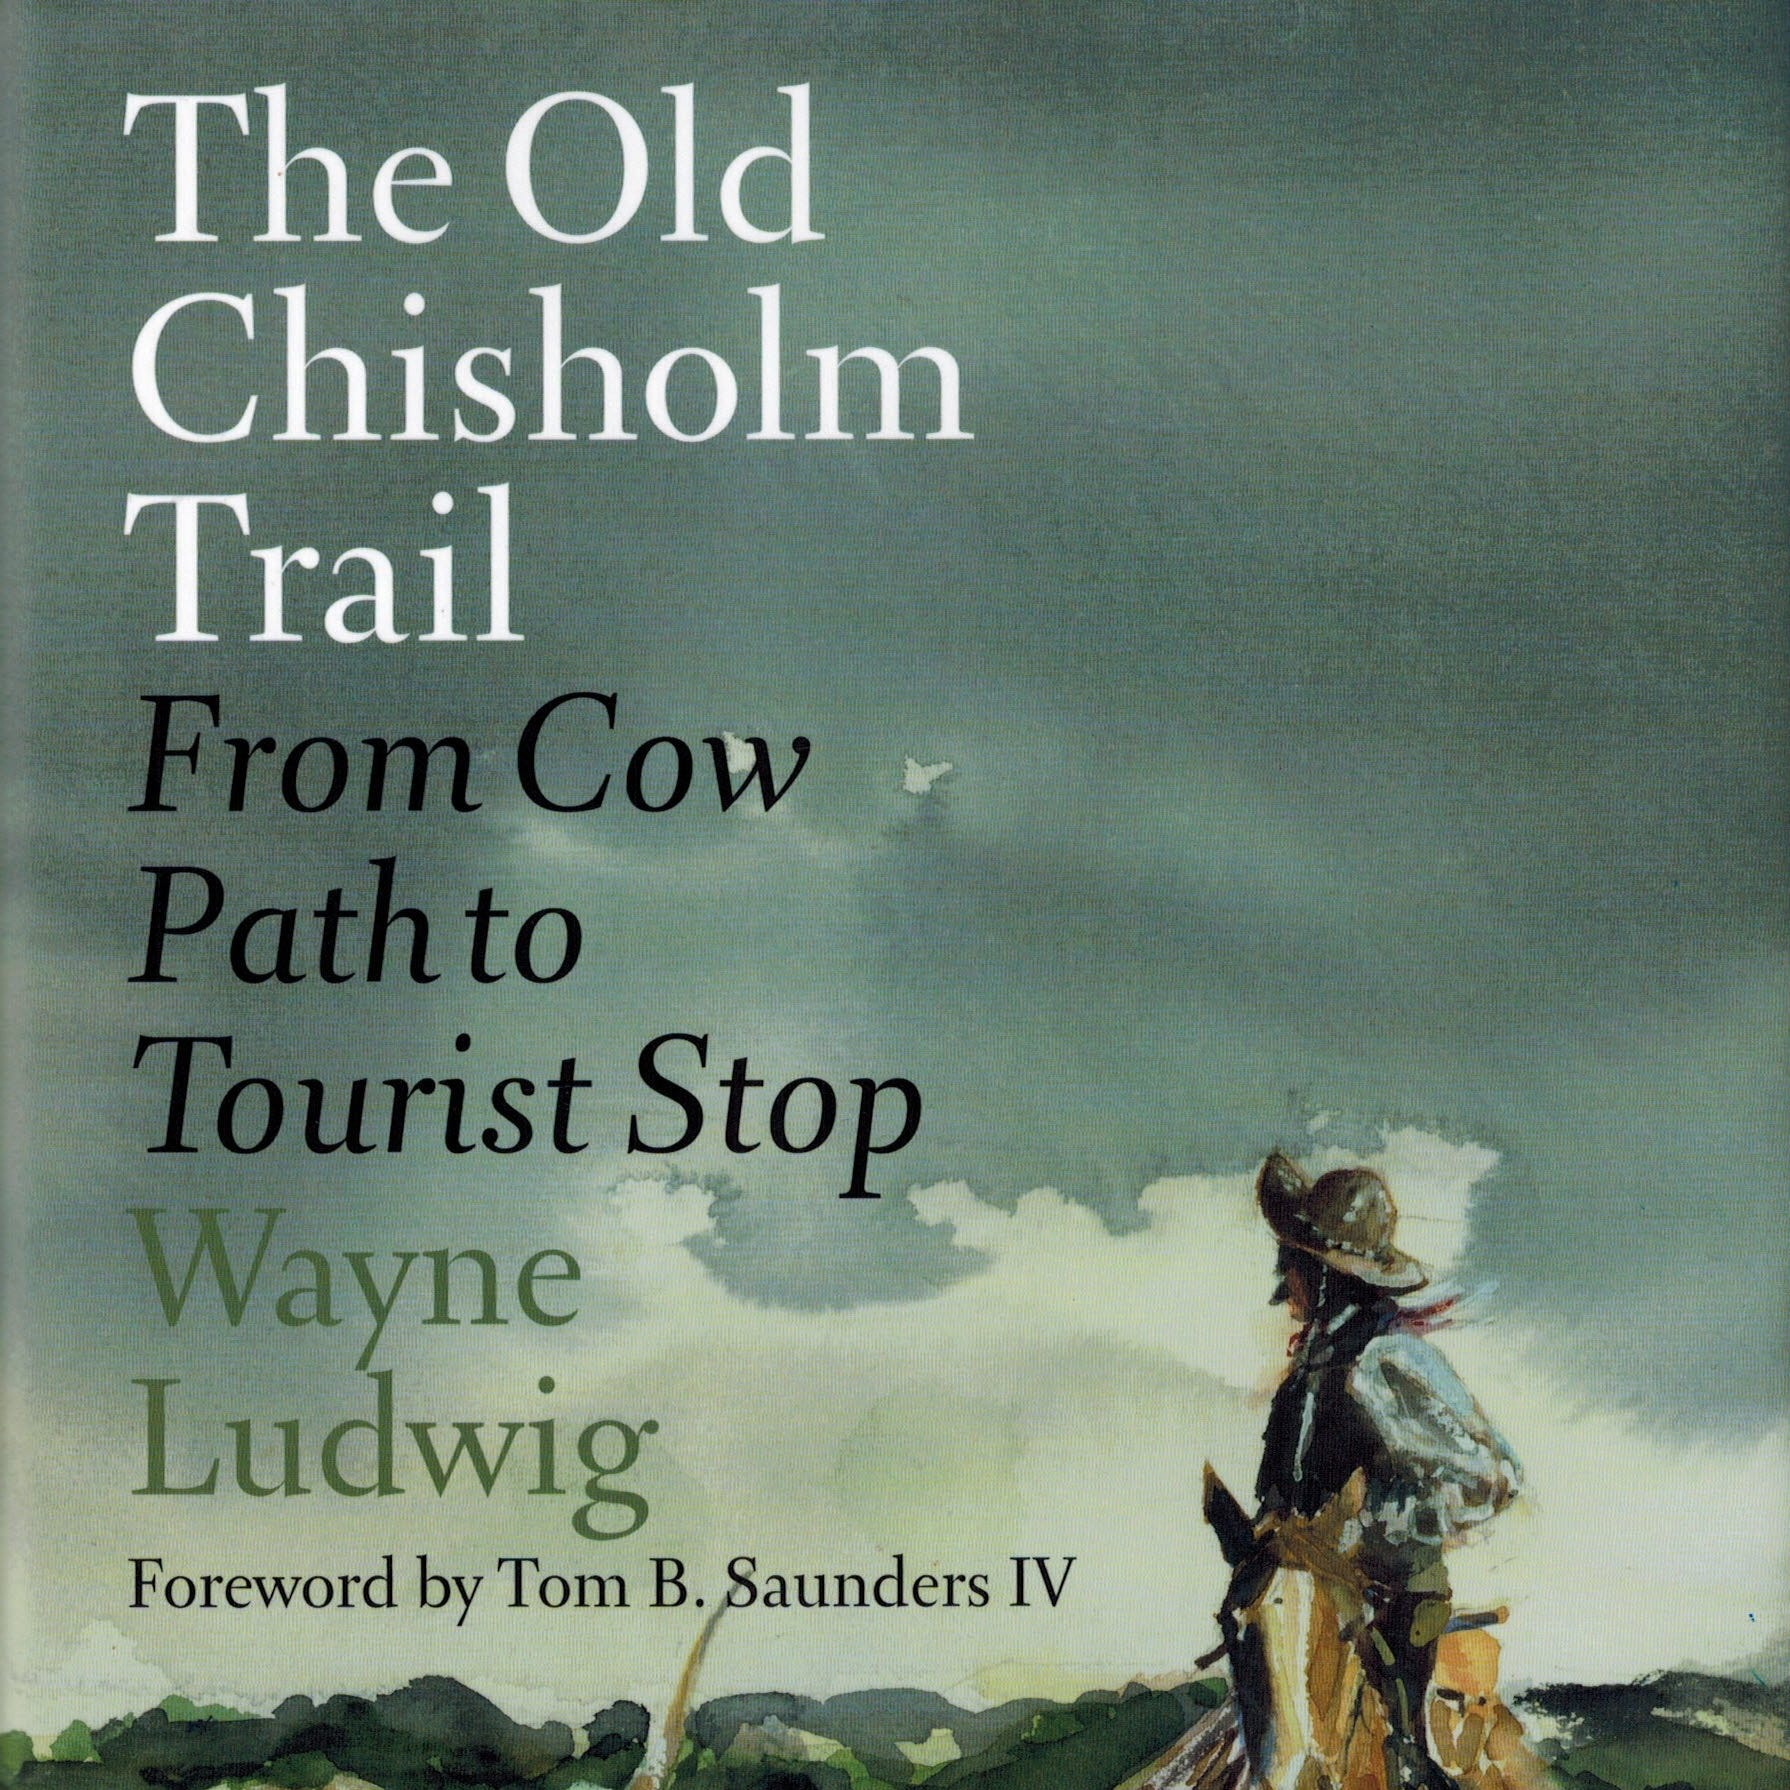 Texas Reads: Historians debate Chisholm Trail in Texas